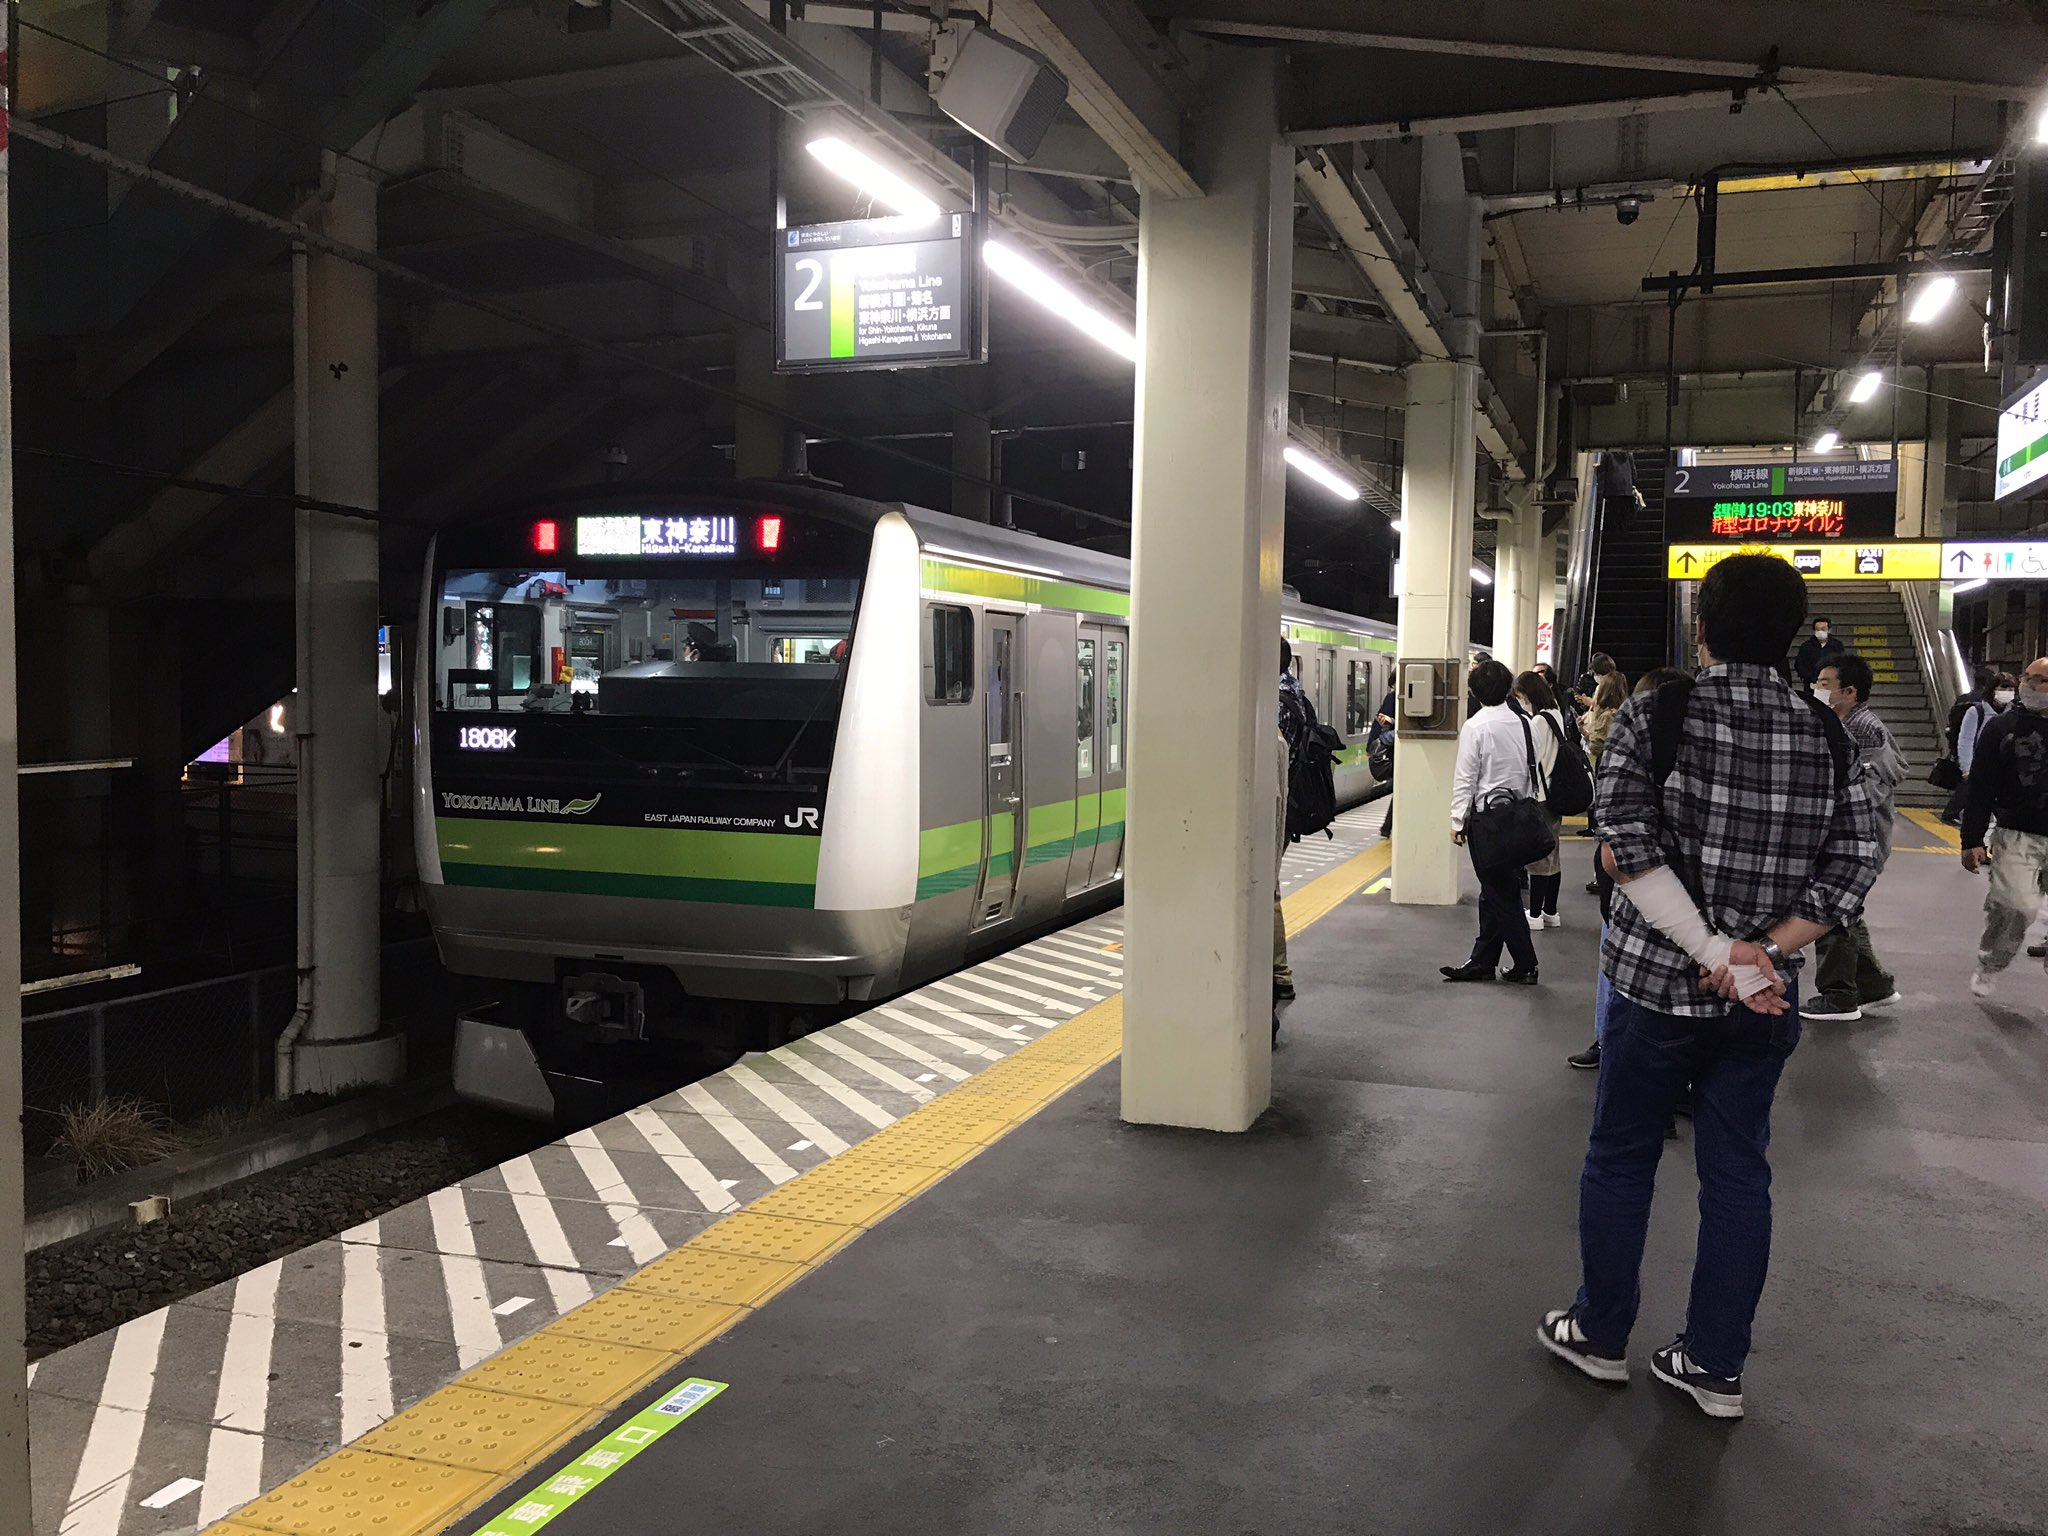 【JR東日本】運転士の居眠りで約70mオーバーラン 横浜線鴨居駅を臨時通過